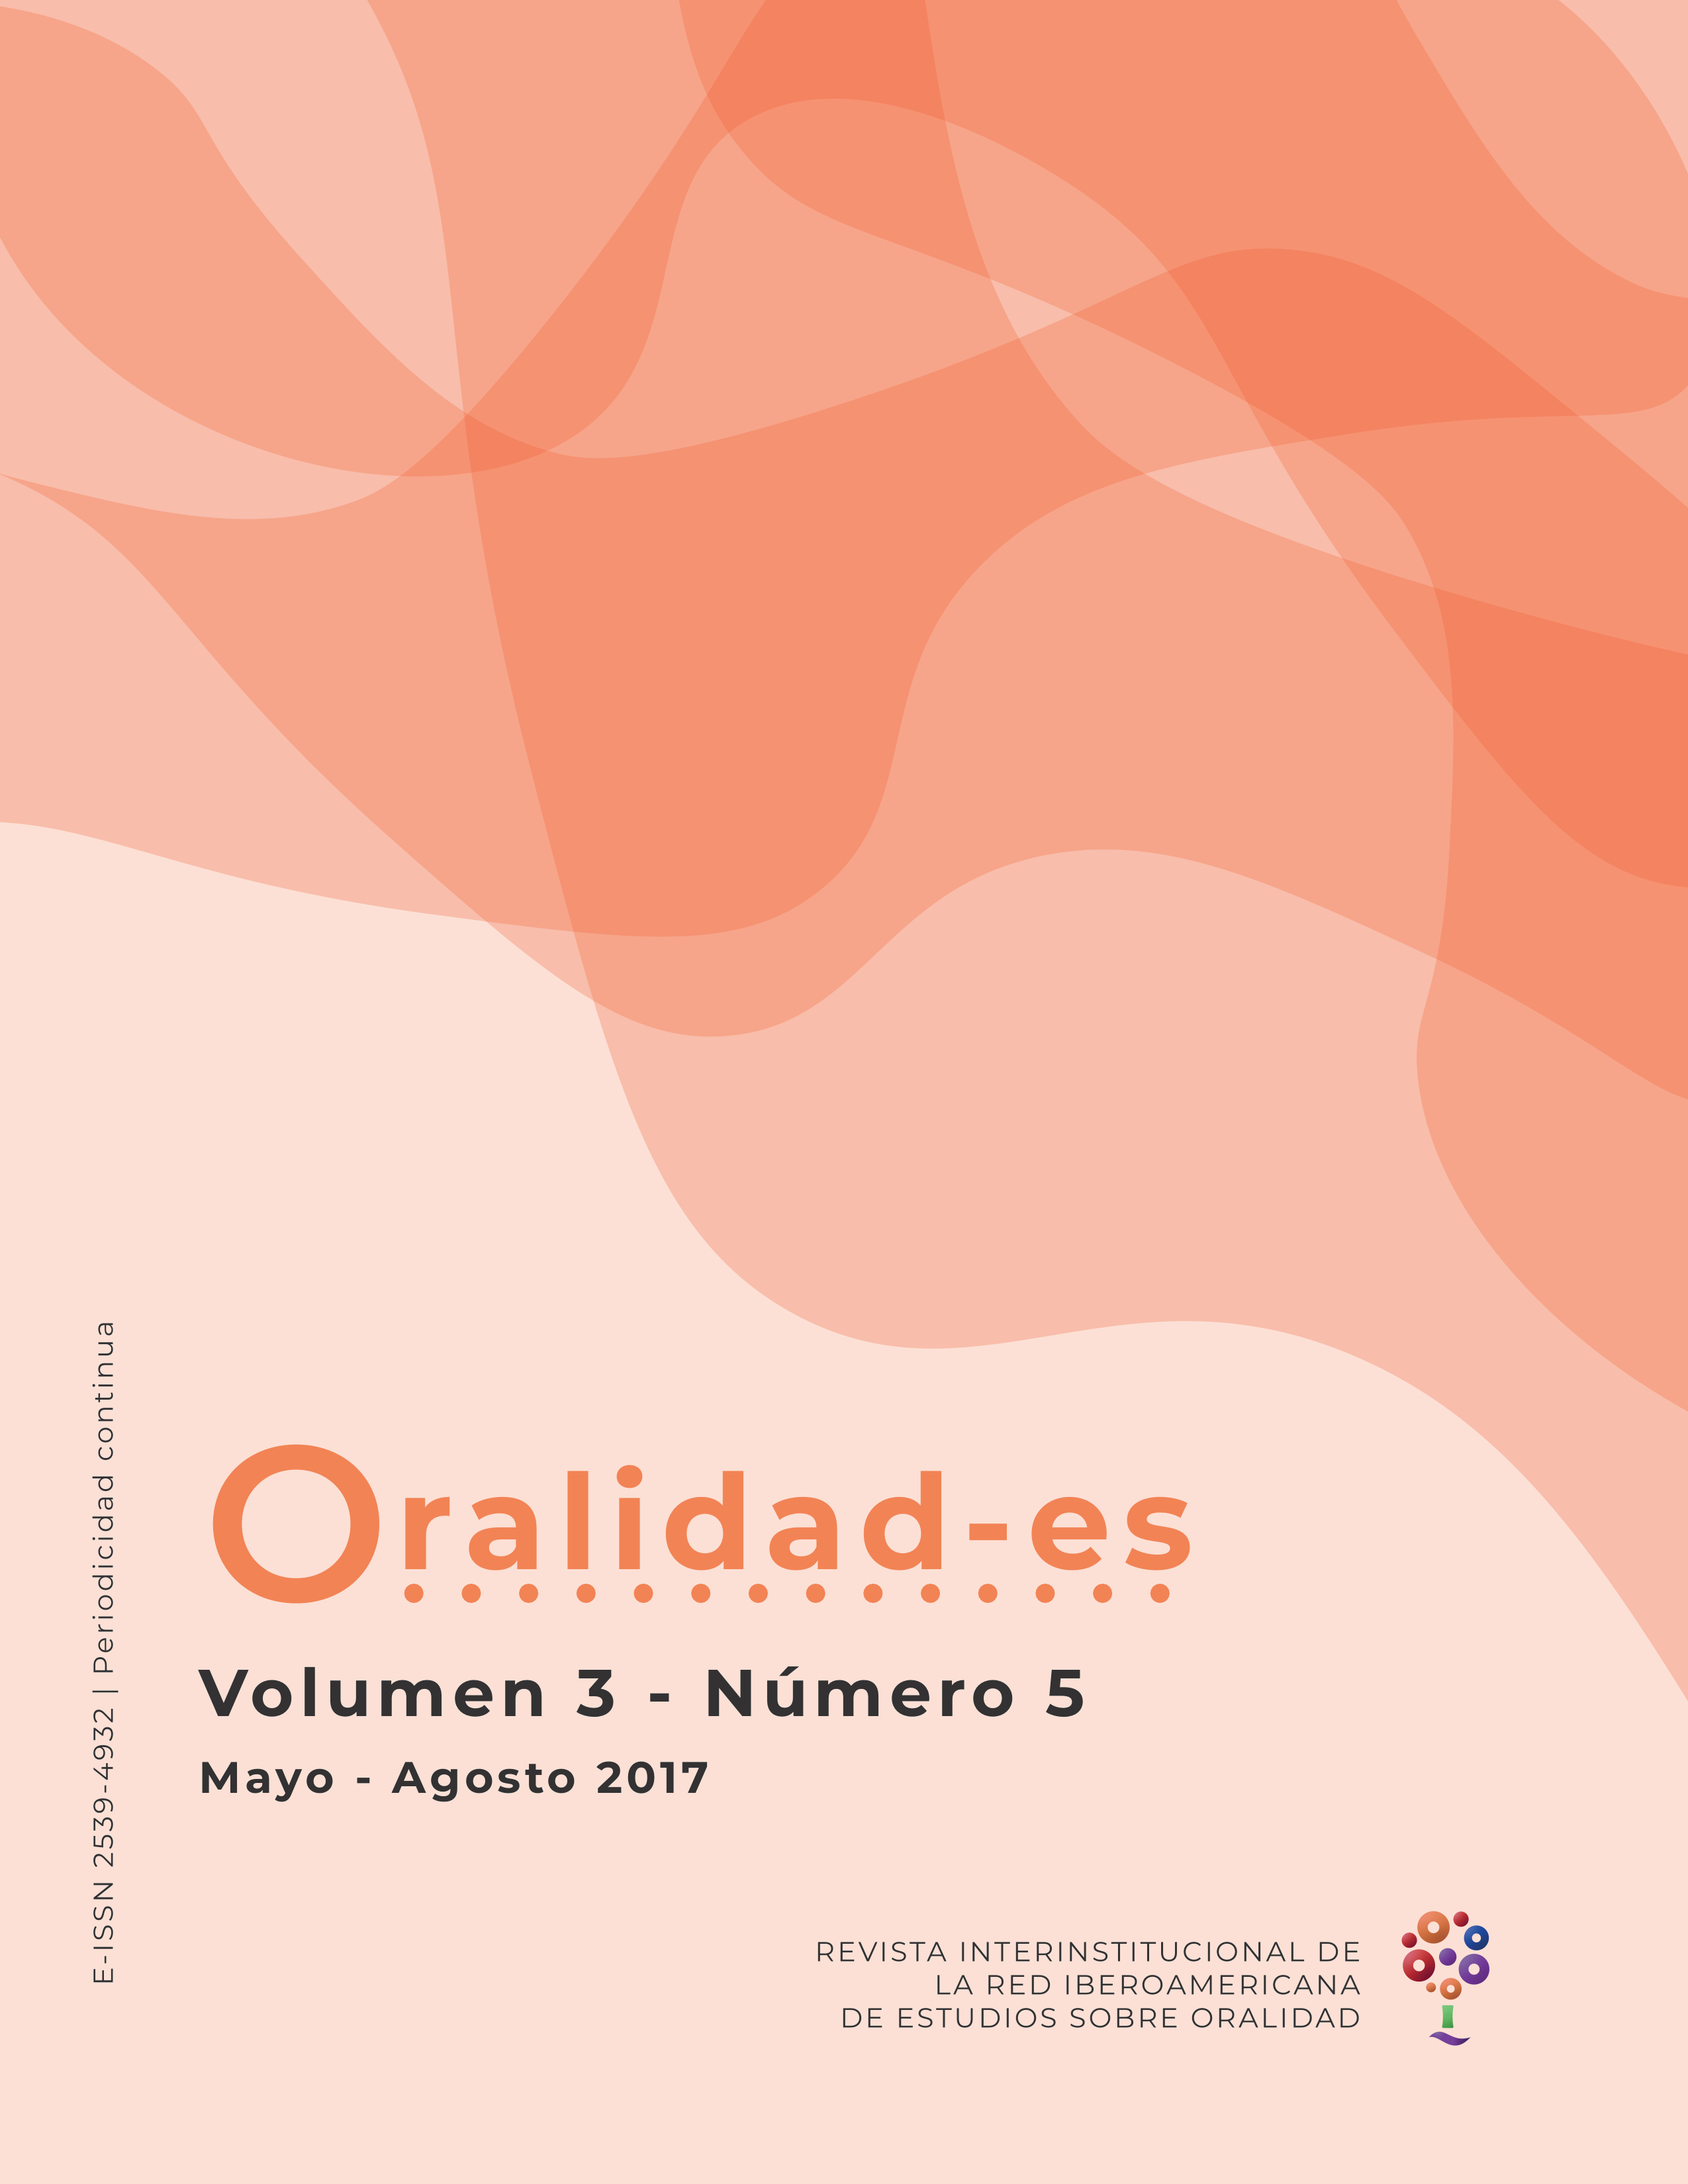 Revista de la Red Iberoamericana de Estudios sobre Oralidad